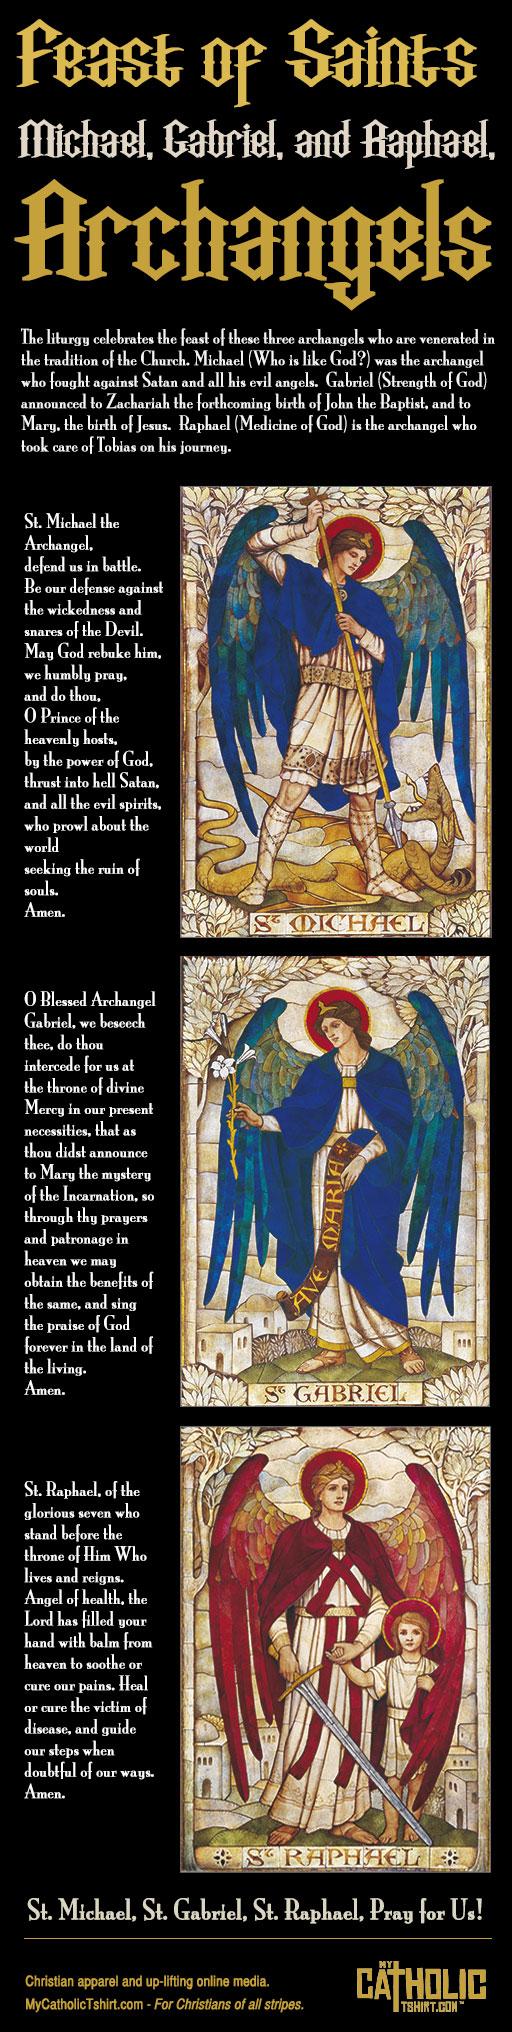 feast of three archangels